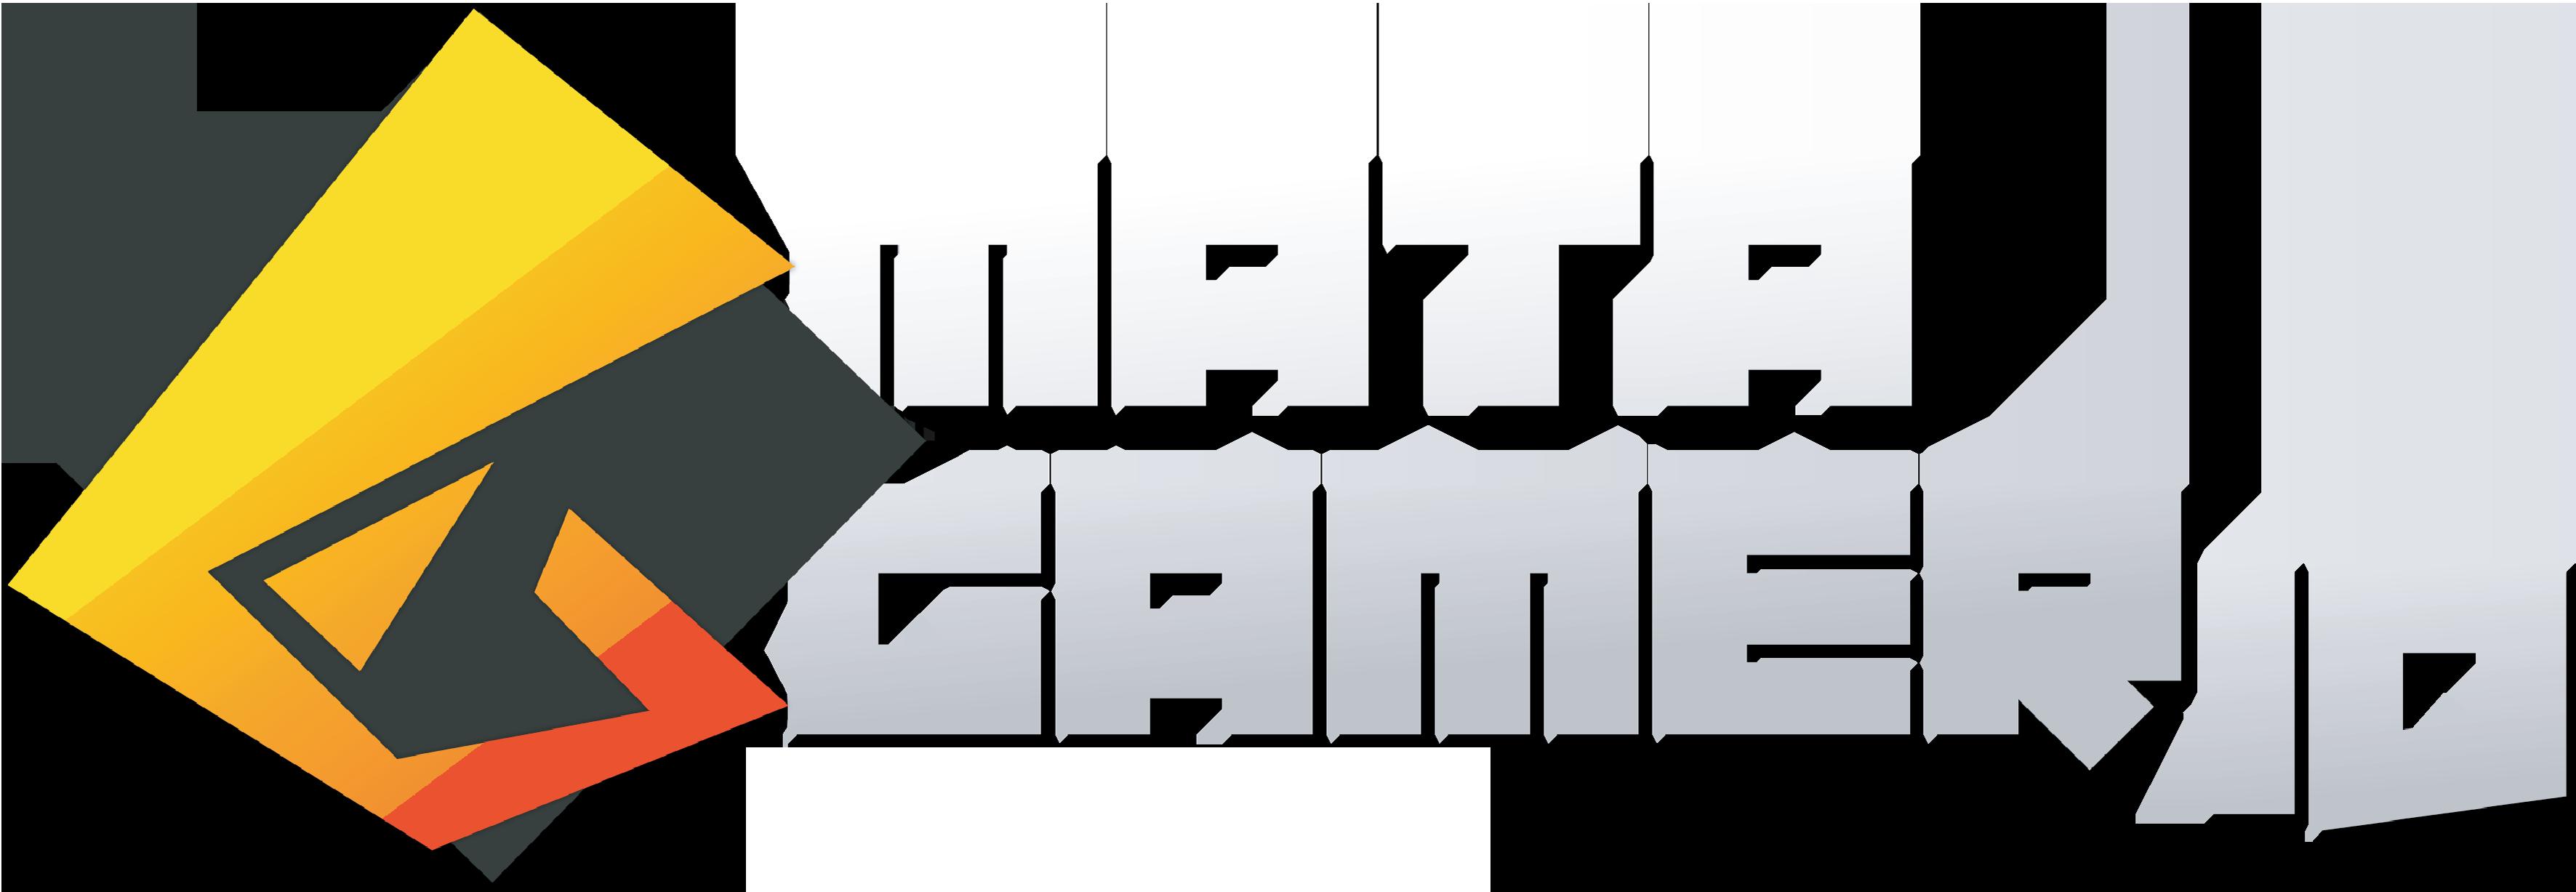 Mata Gamer